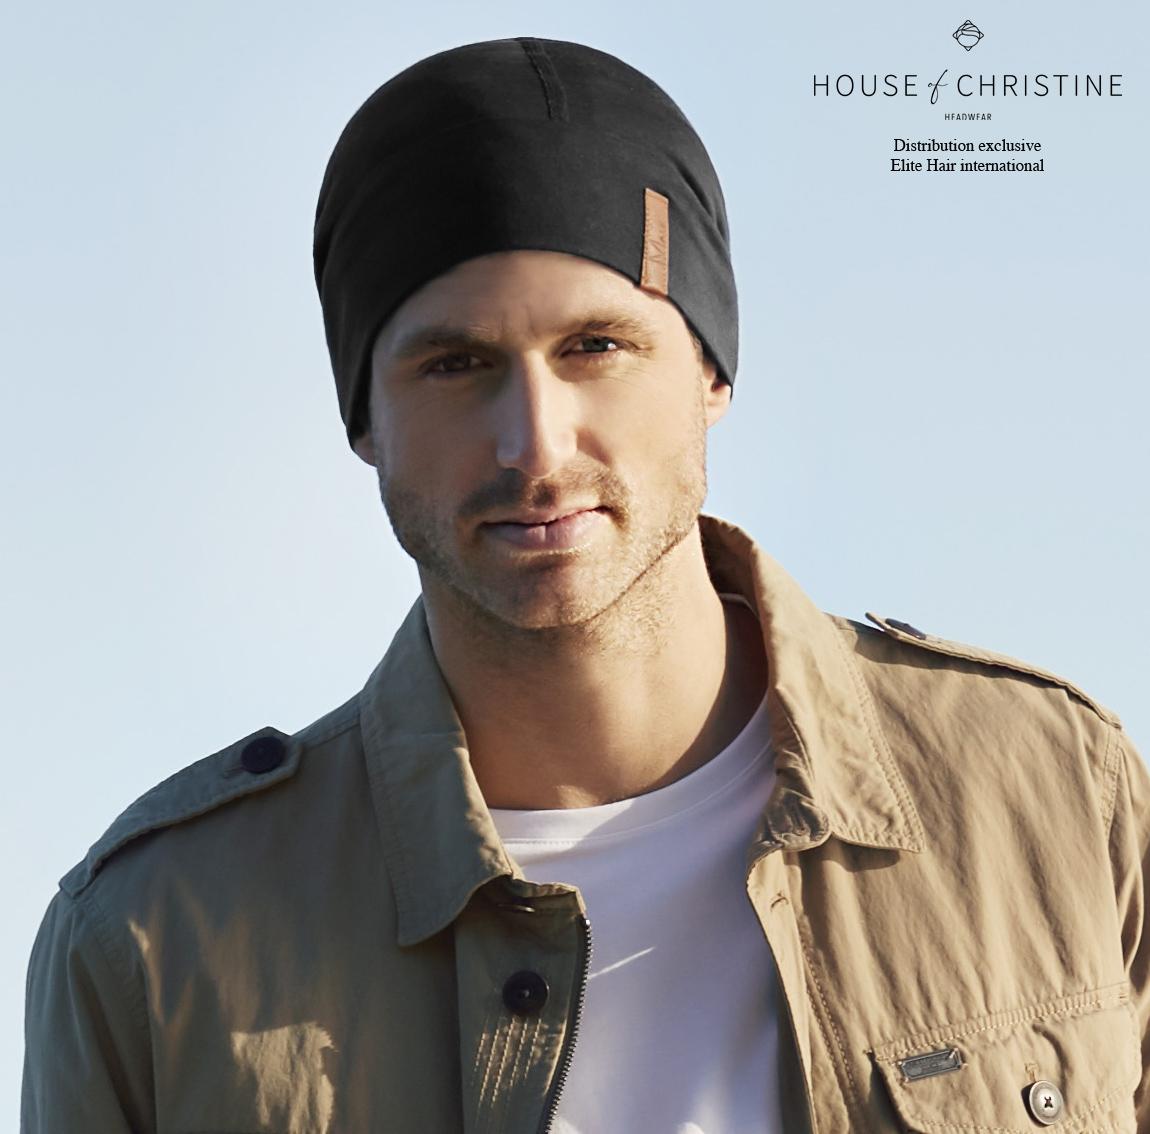 Bonnet chimio, bonnet homme 37.5, onyx, christine headwear